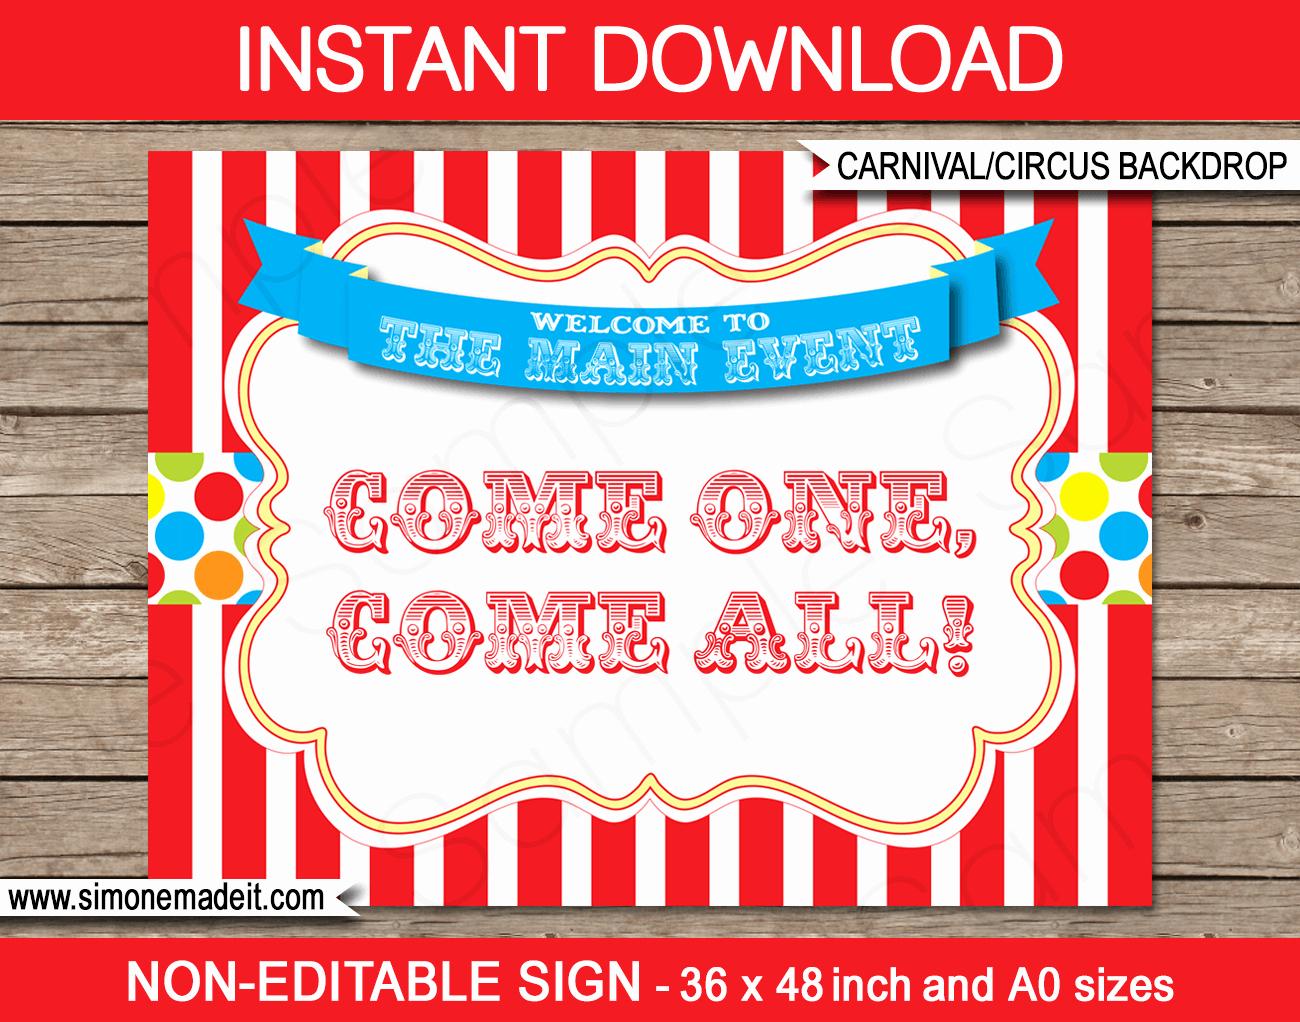 Free Printable Carnival Invitation Templates New Printable Carnival Party Backdrop Sign